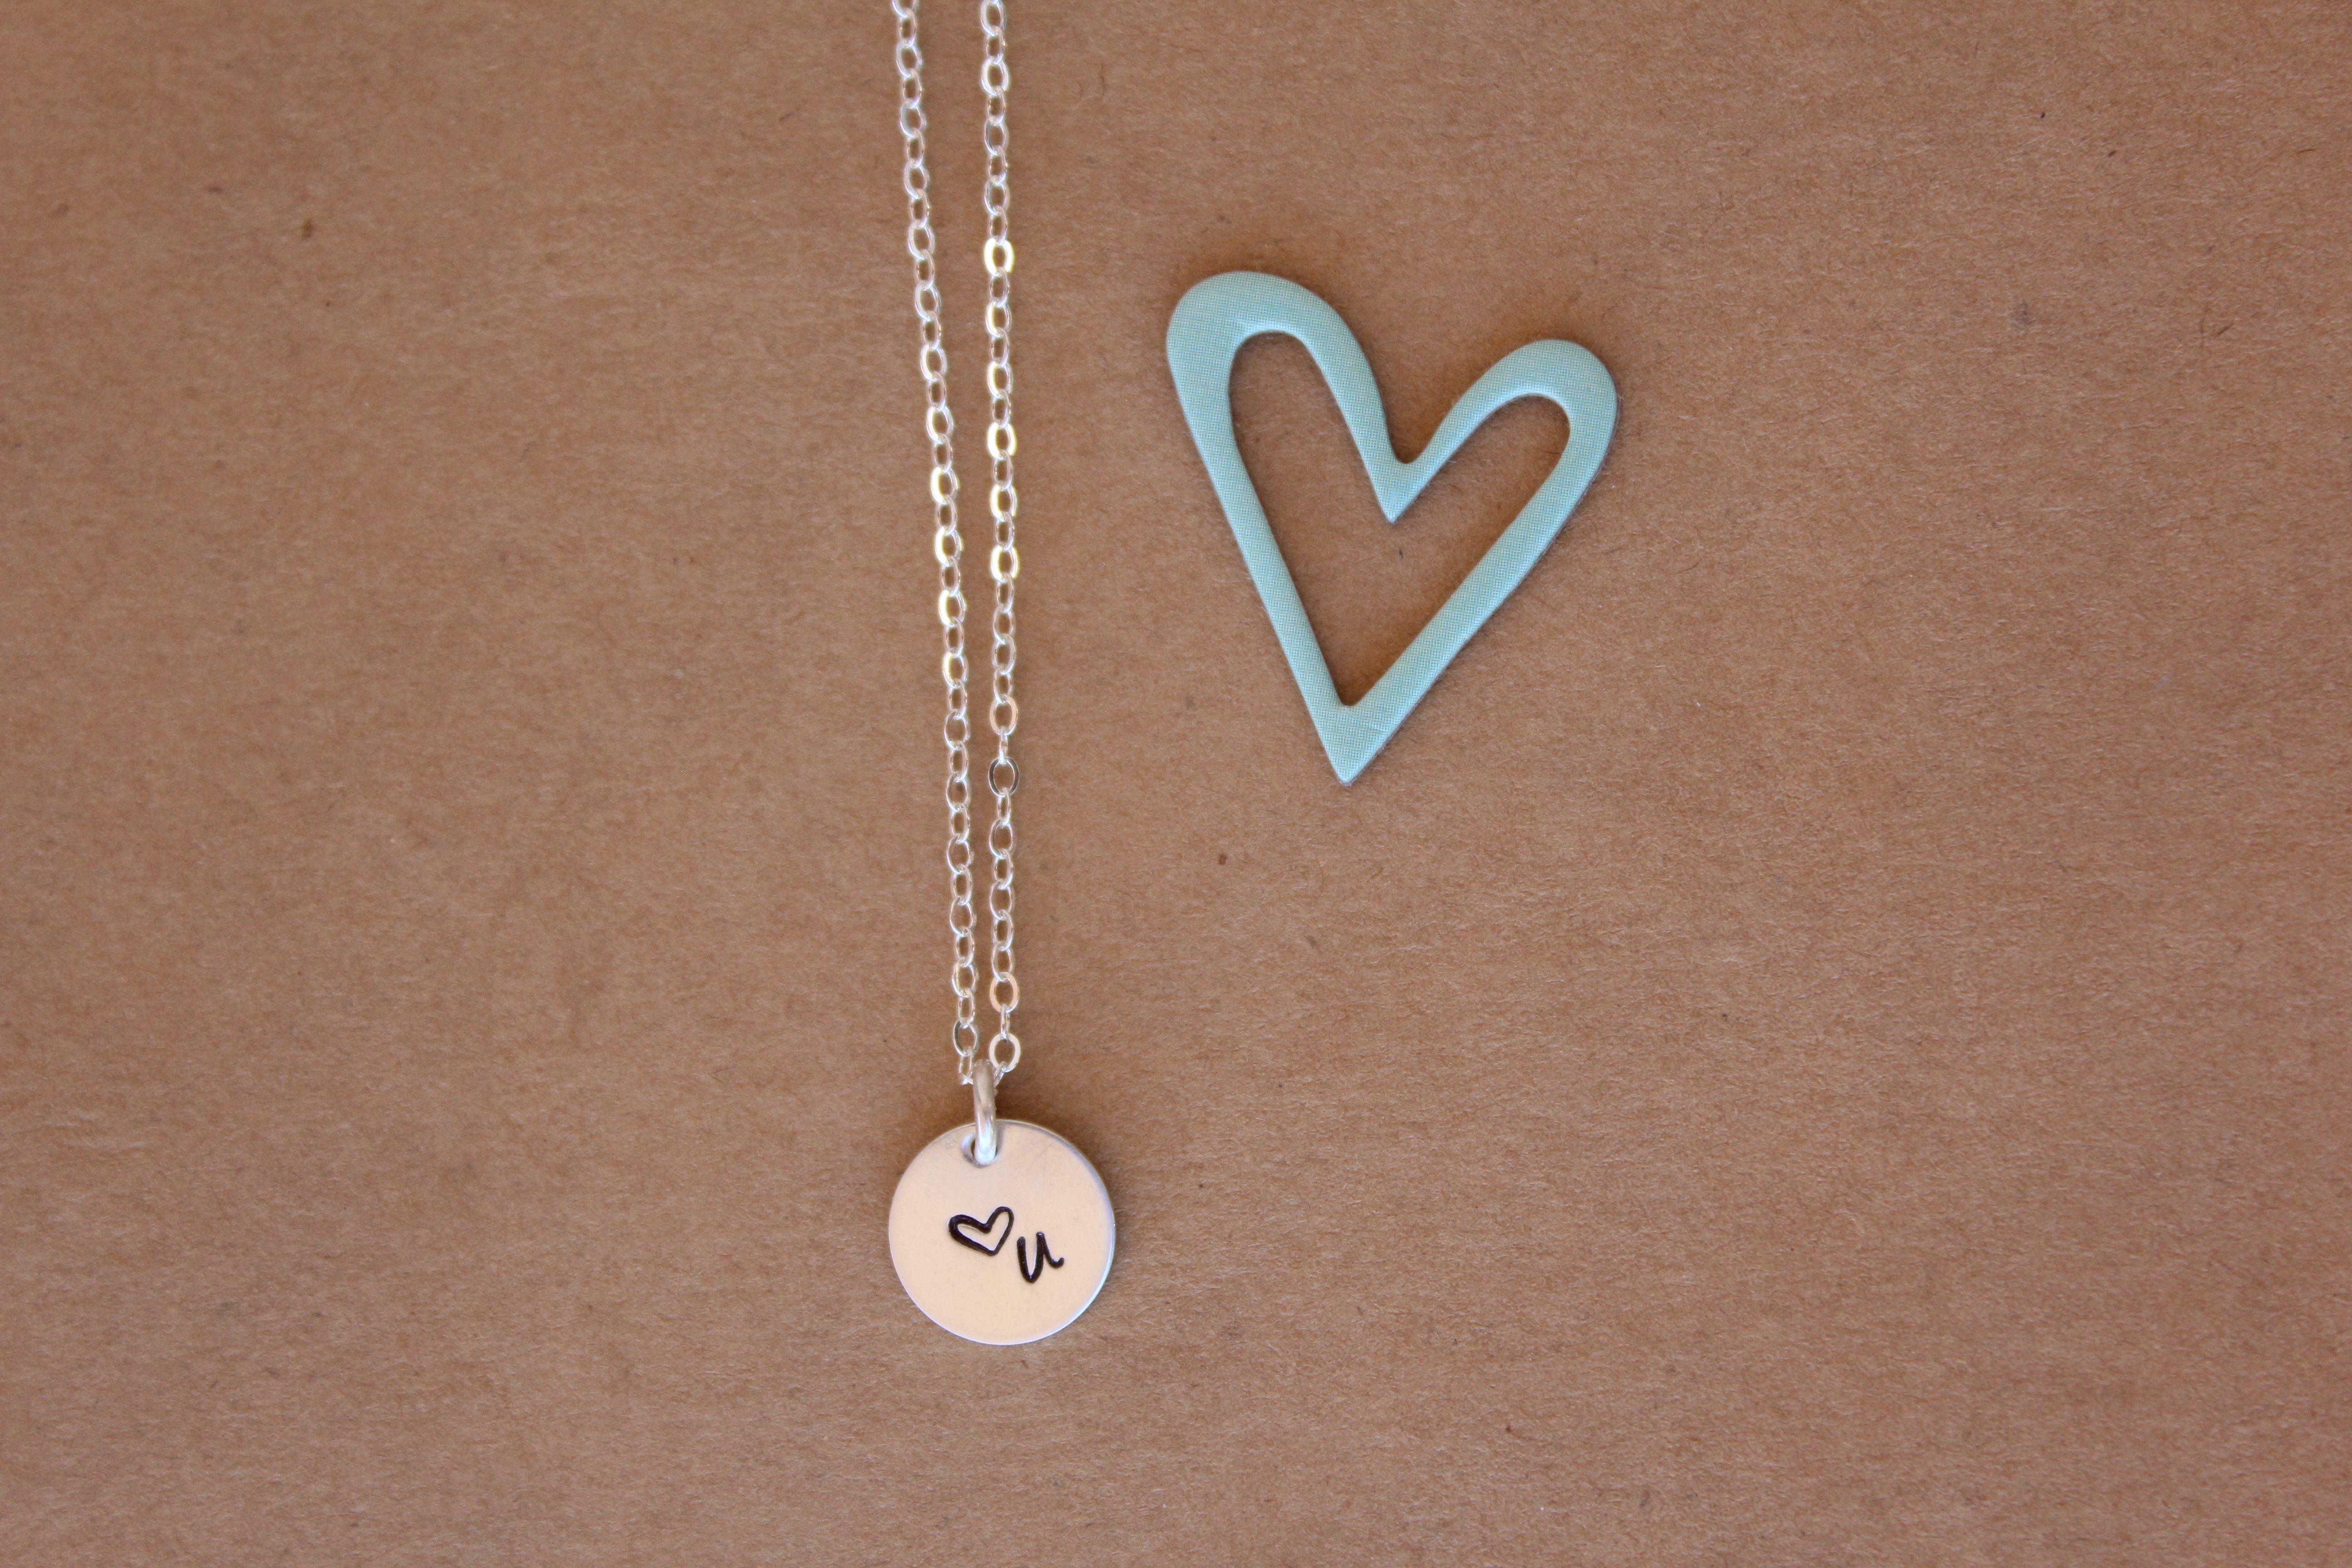 <3 this handstamped necklace! #love #handstampednecklace